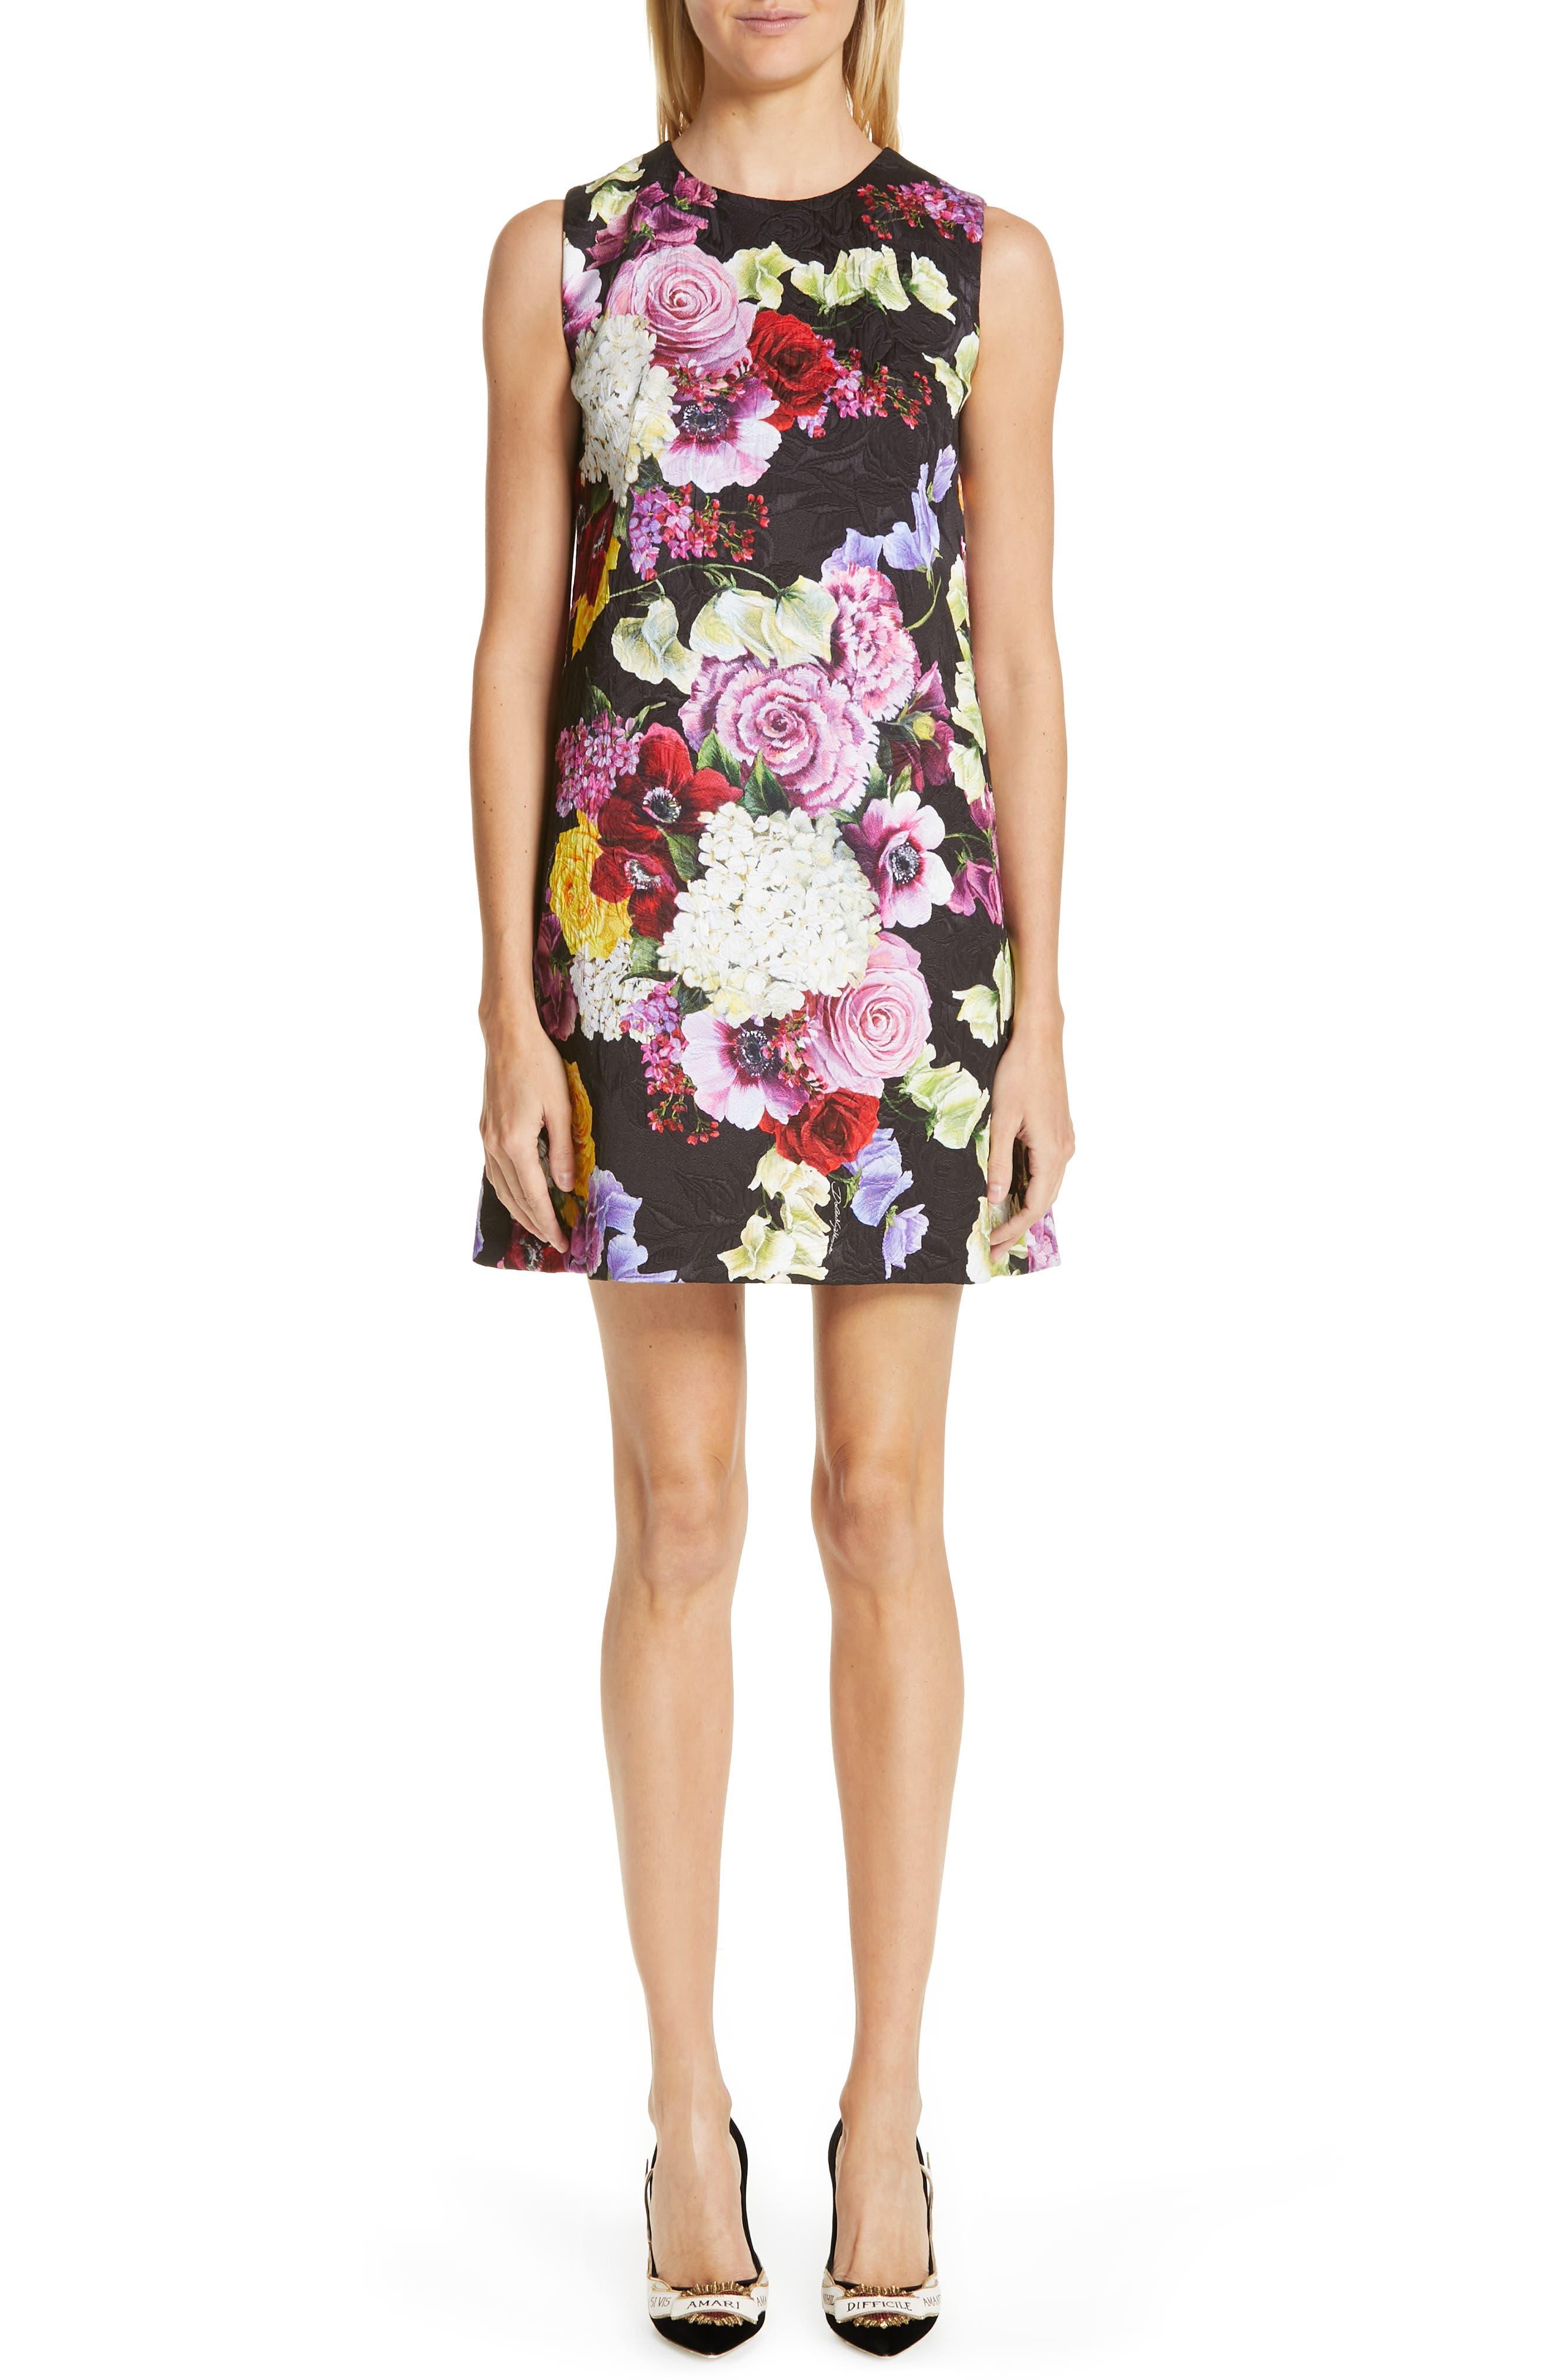 Dolce & gabbana Floral Print Shift Dress, US / 42 IT - Black